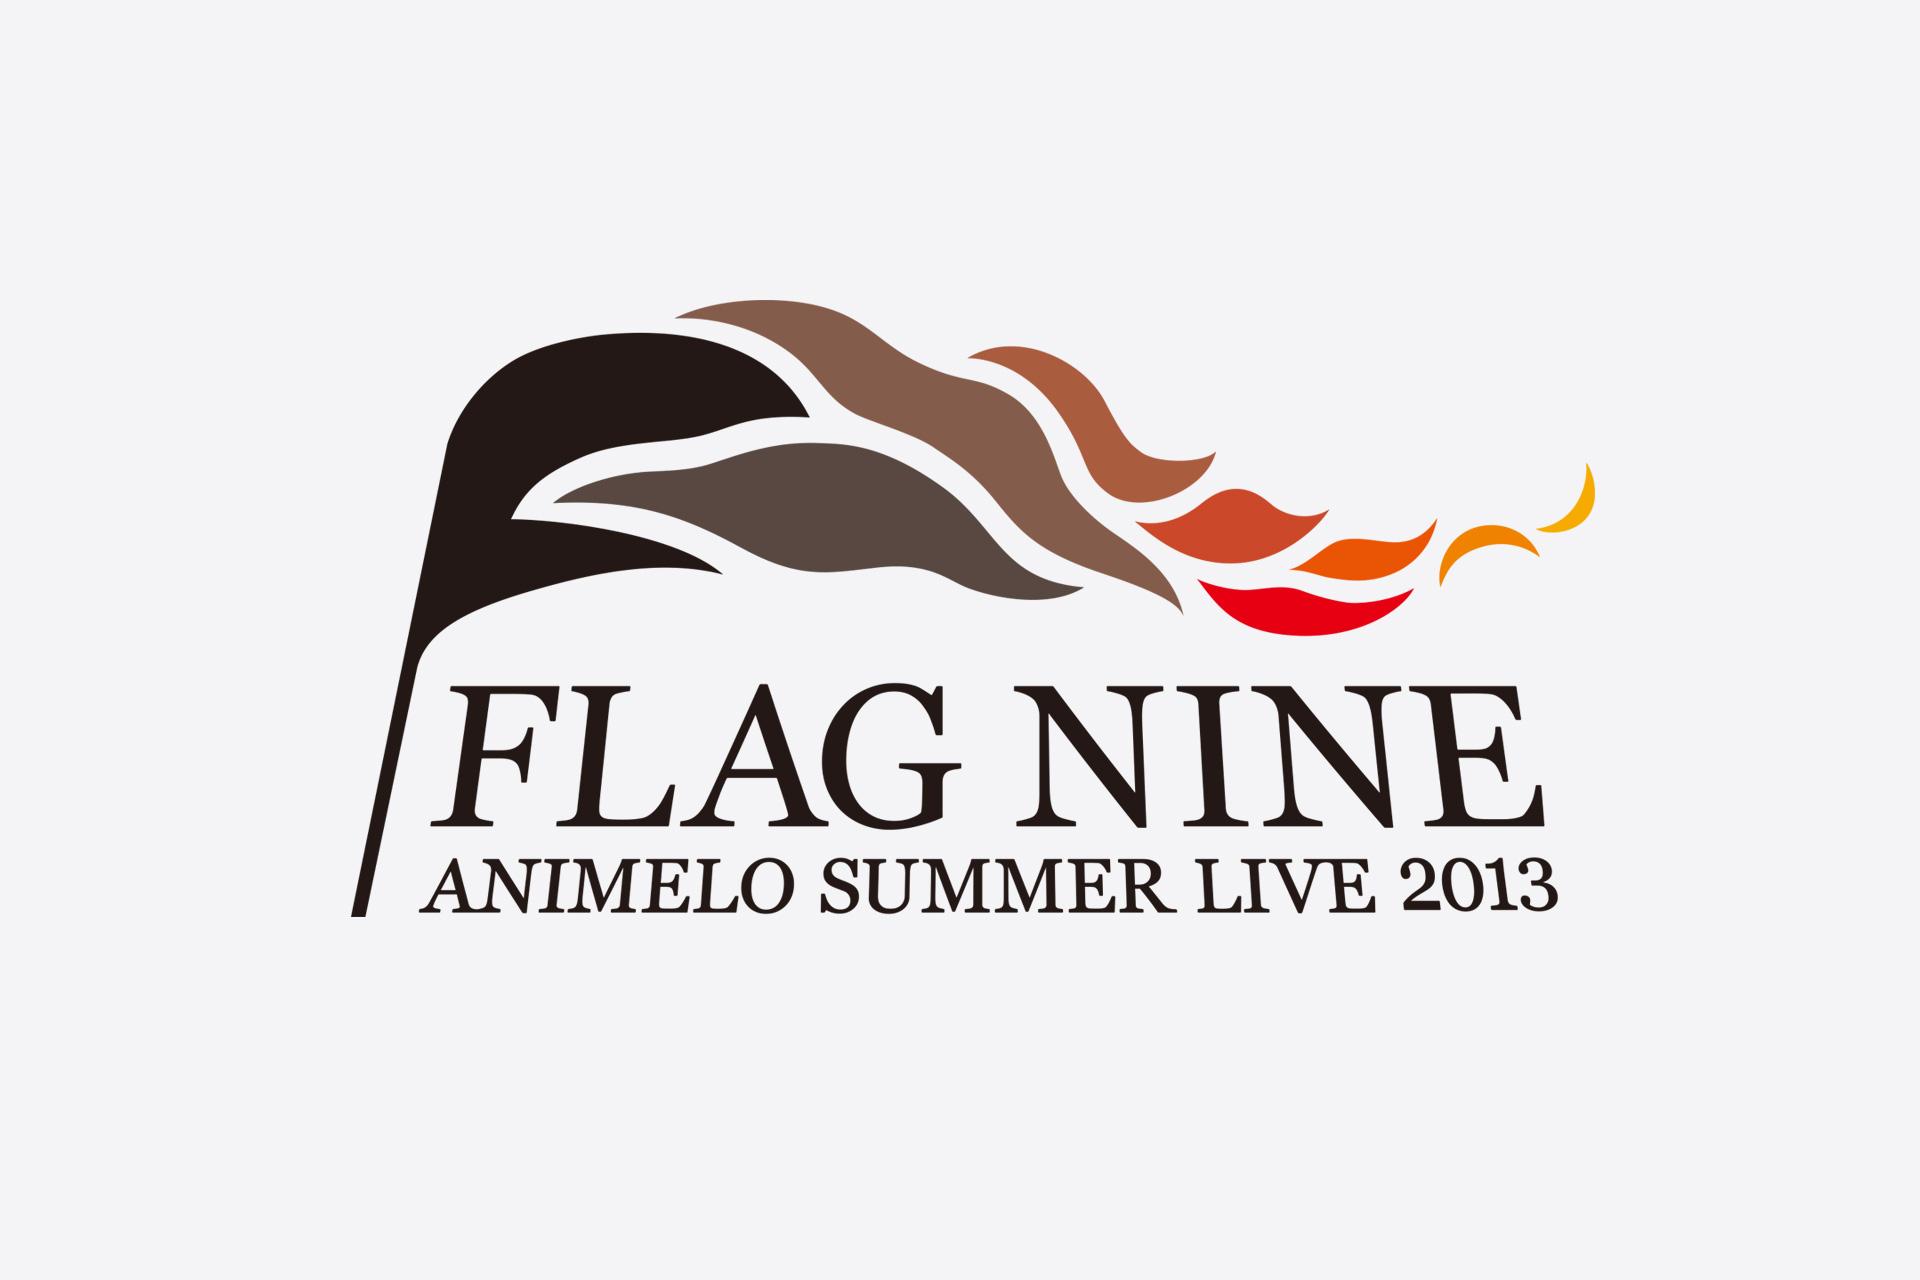 ANIMELO SUMMER LIVE 2013 FLAG NINE